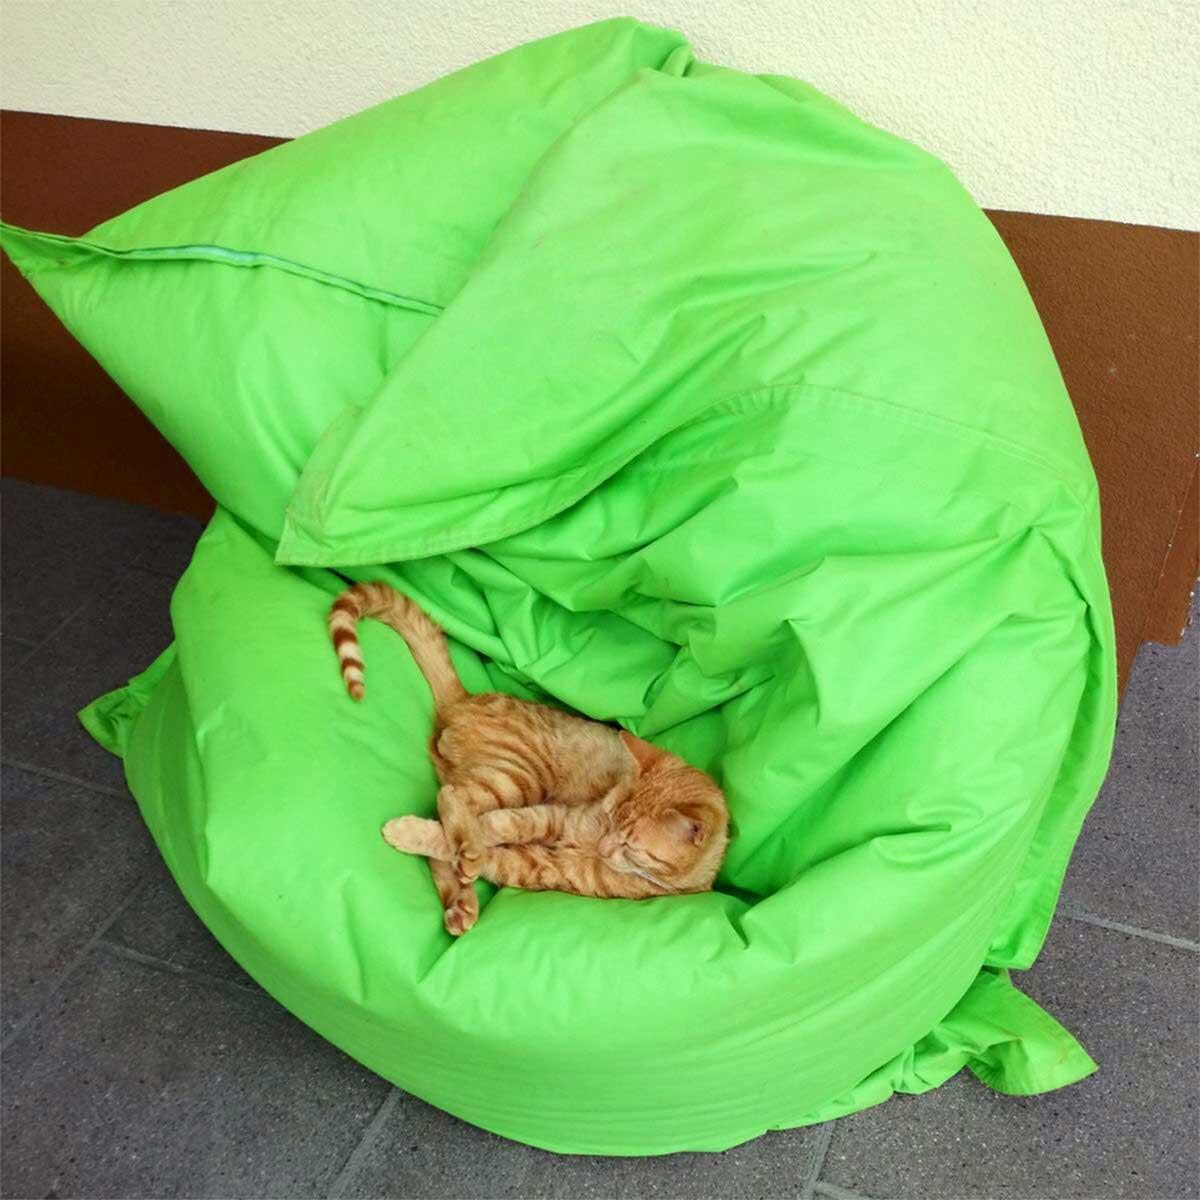 Harmonieren Katze und Sitzsack?